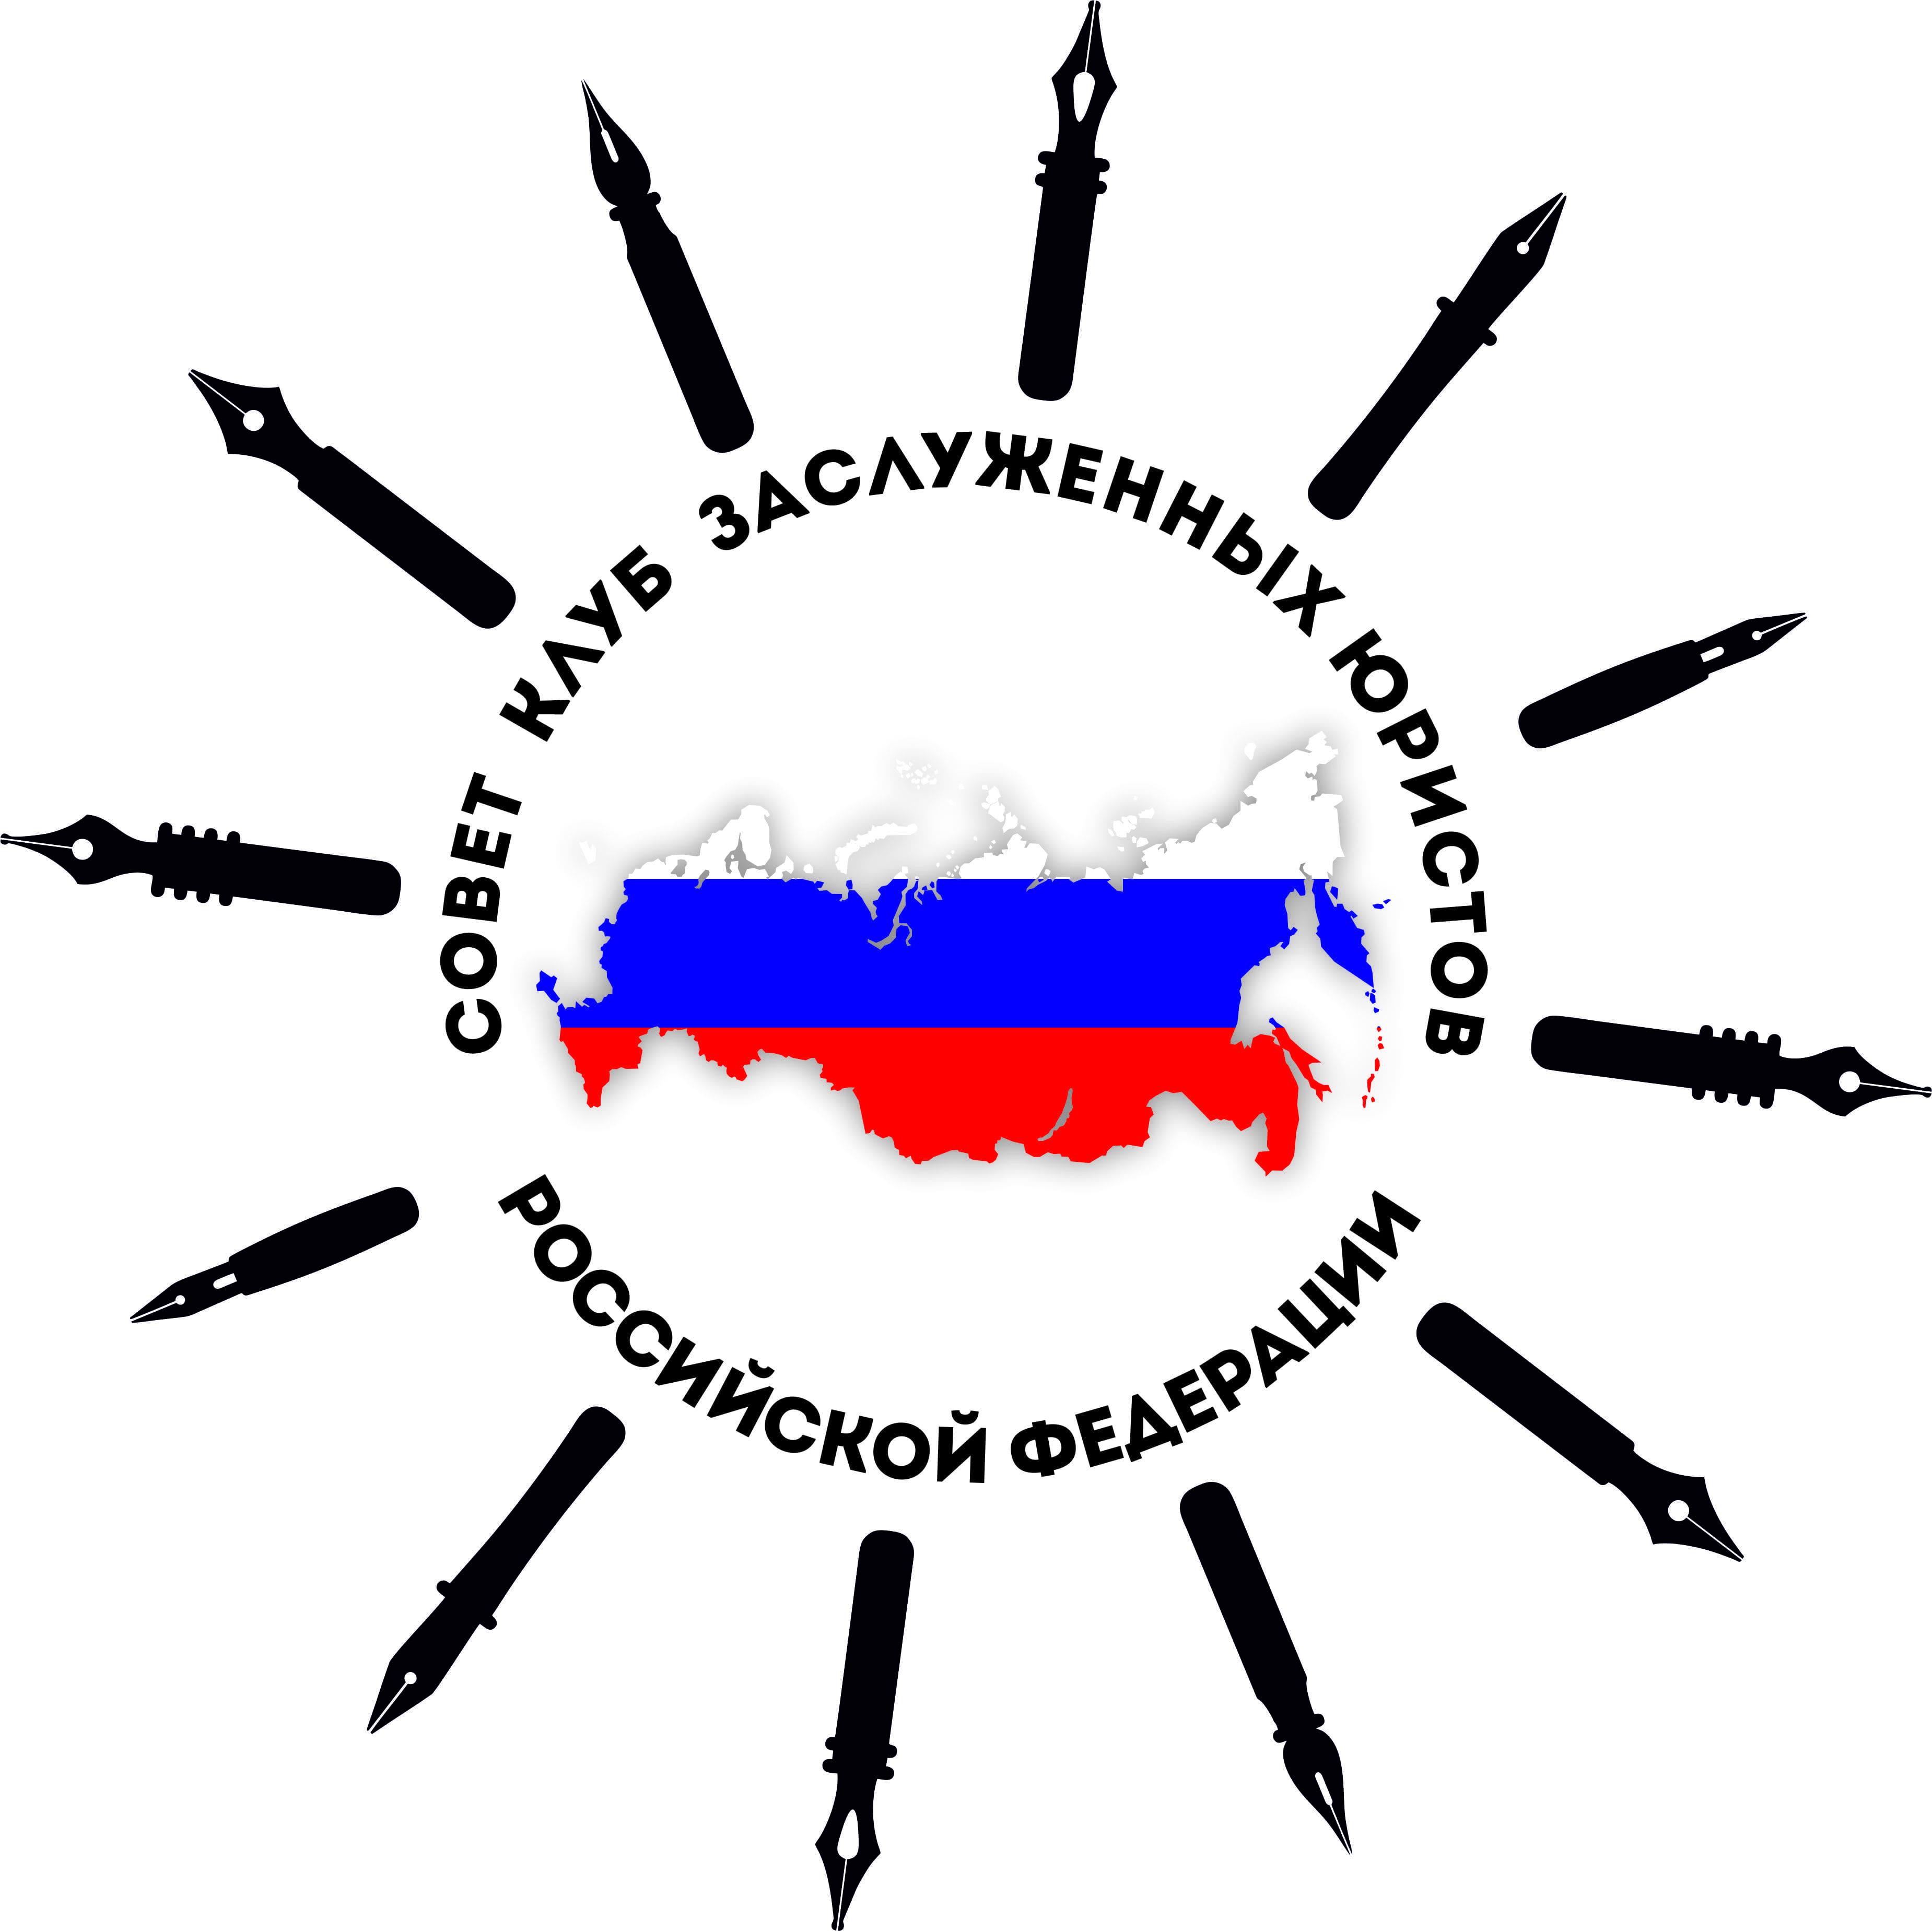 Разработка логотипа Совета (Клуба) заслуженных юристов Российской Федерации фото f_5915e4181288cc6f.jpg